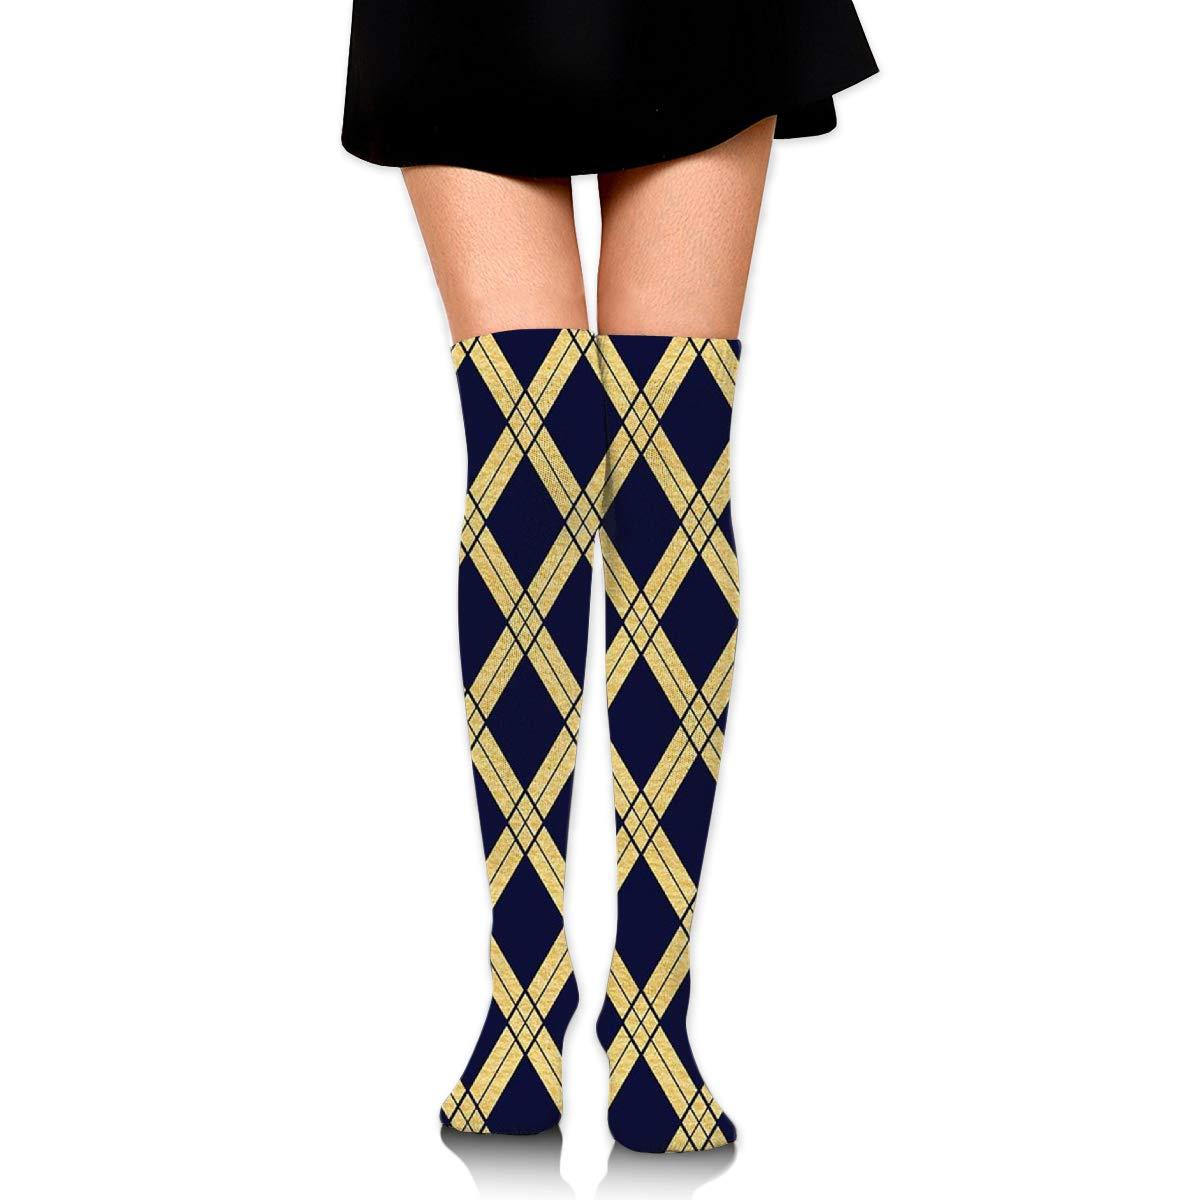 Knee-length Socks Navy Blue Dress With Gold LaceFashion Womens Knee Socks Dresses And Socks